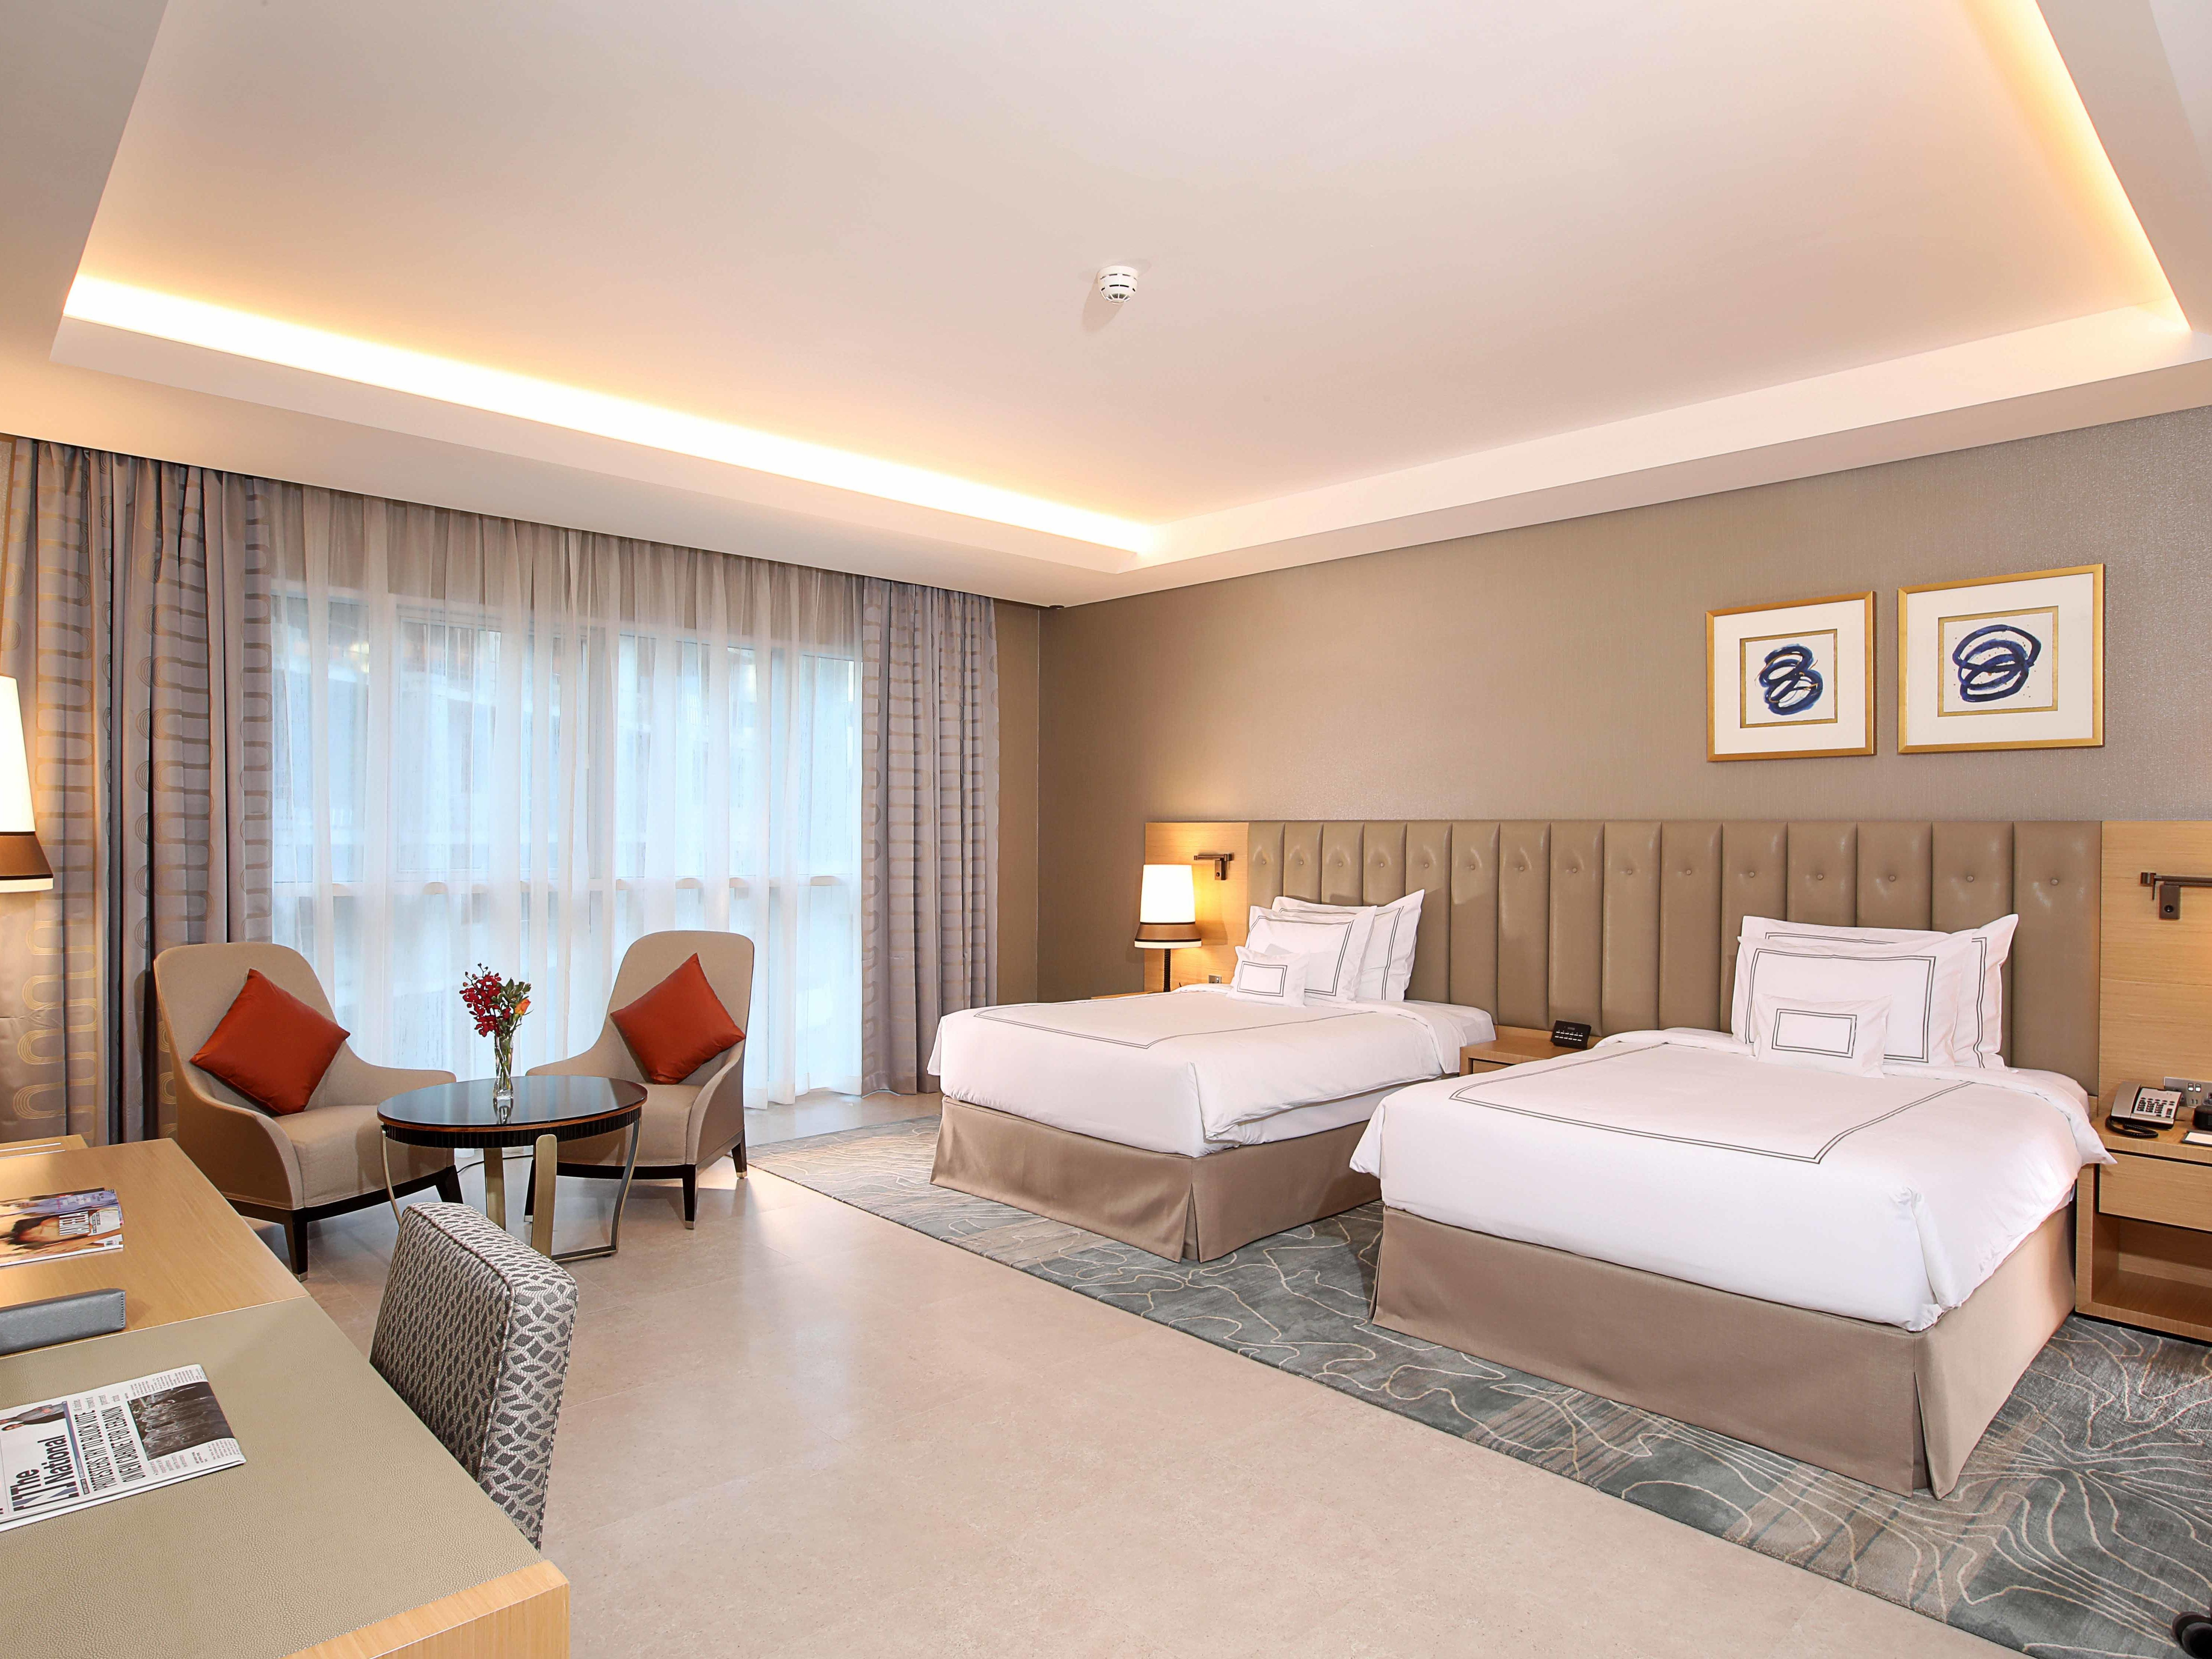 Premium Room at Grand Cosmopolitan Hotel in Dubai